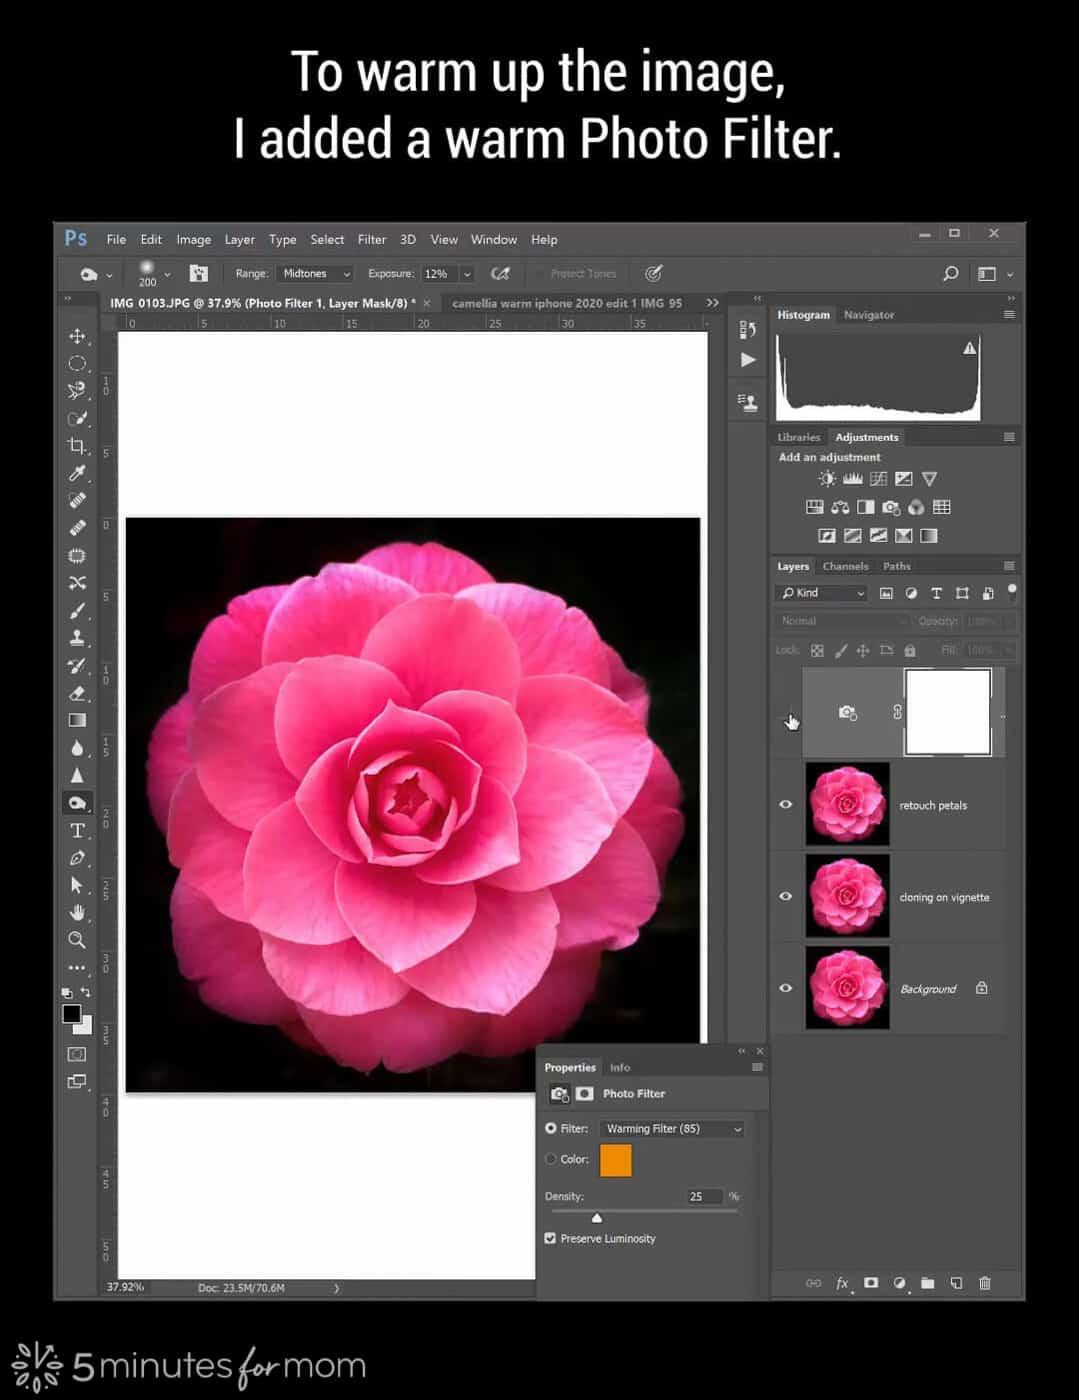 Warm Photo Filter in Photoshop